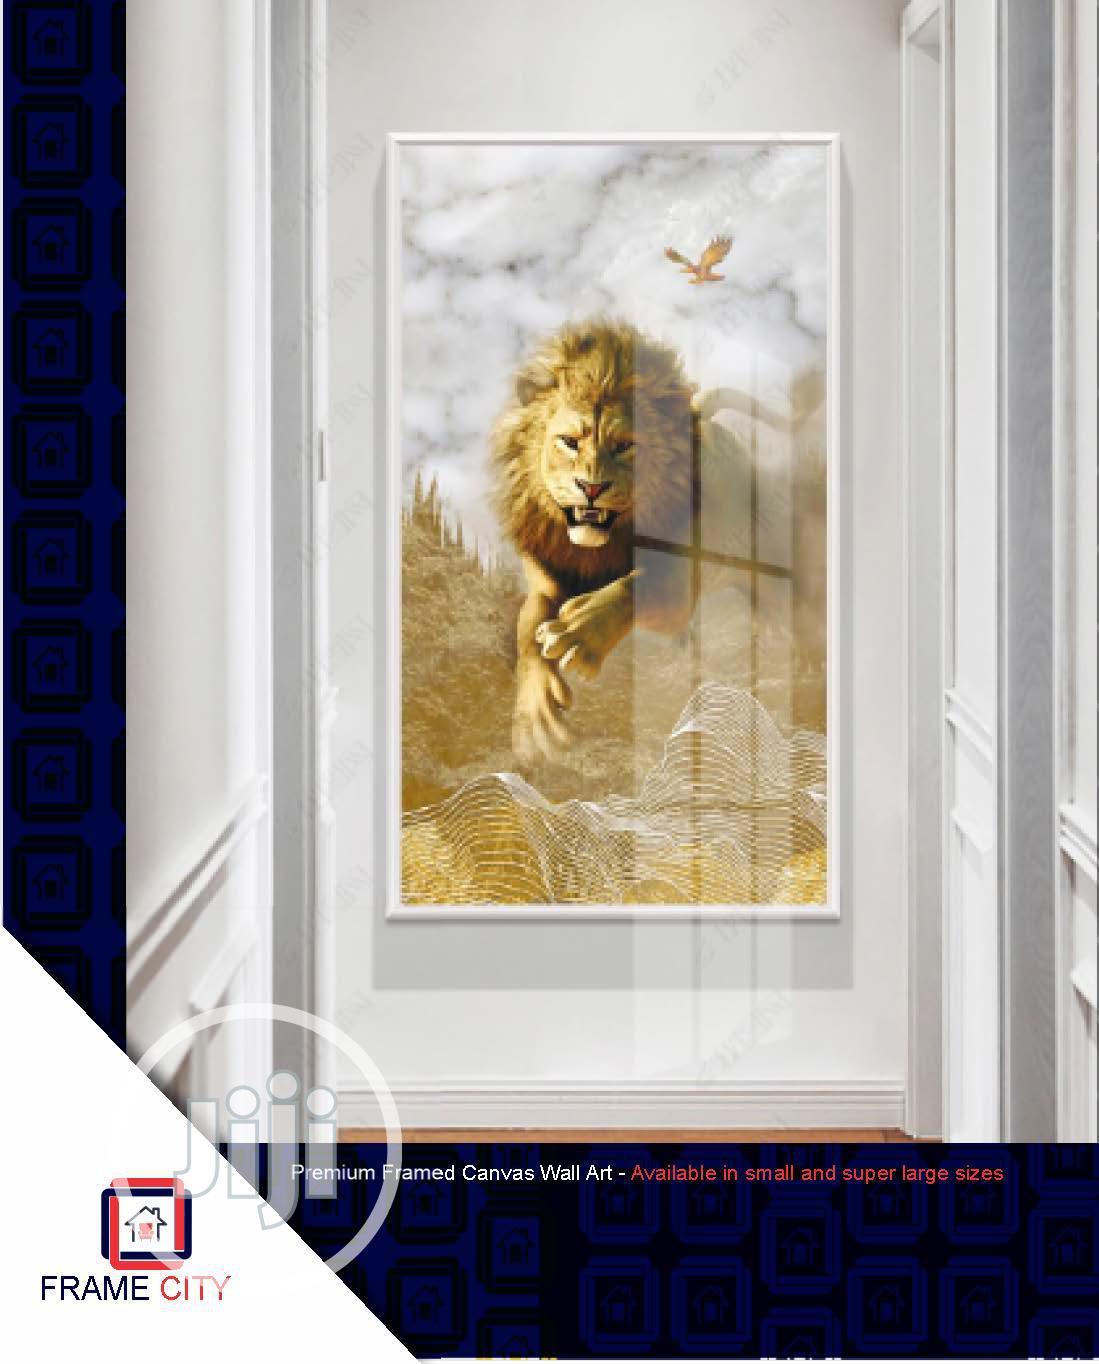 Archive: Premium Framed Digital Canvas Artwork.